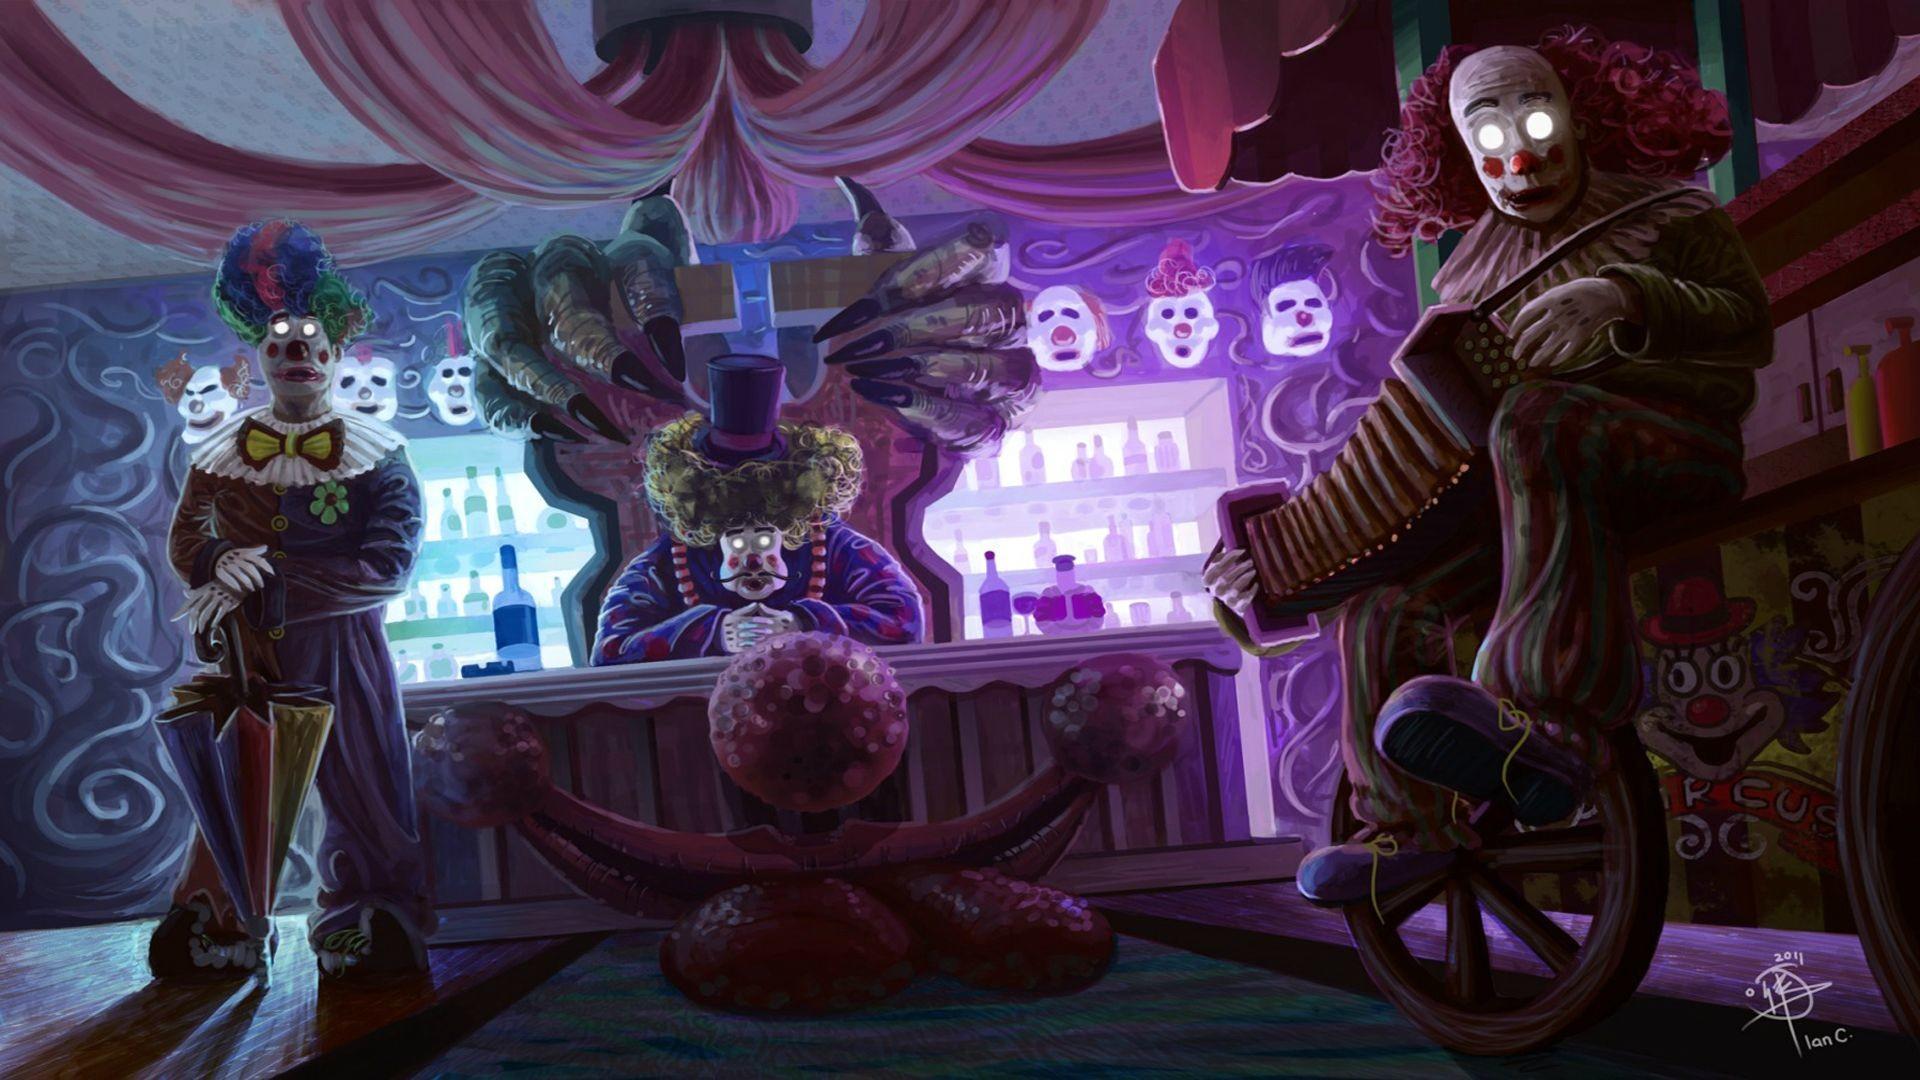 Res: 1920x1080, Illustration horror clown circus creepy wallpaper |  | 125420 |  WallpaperUP